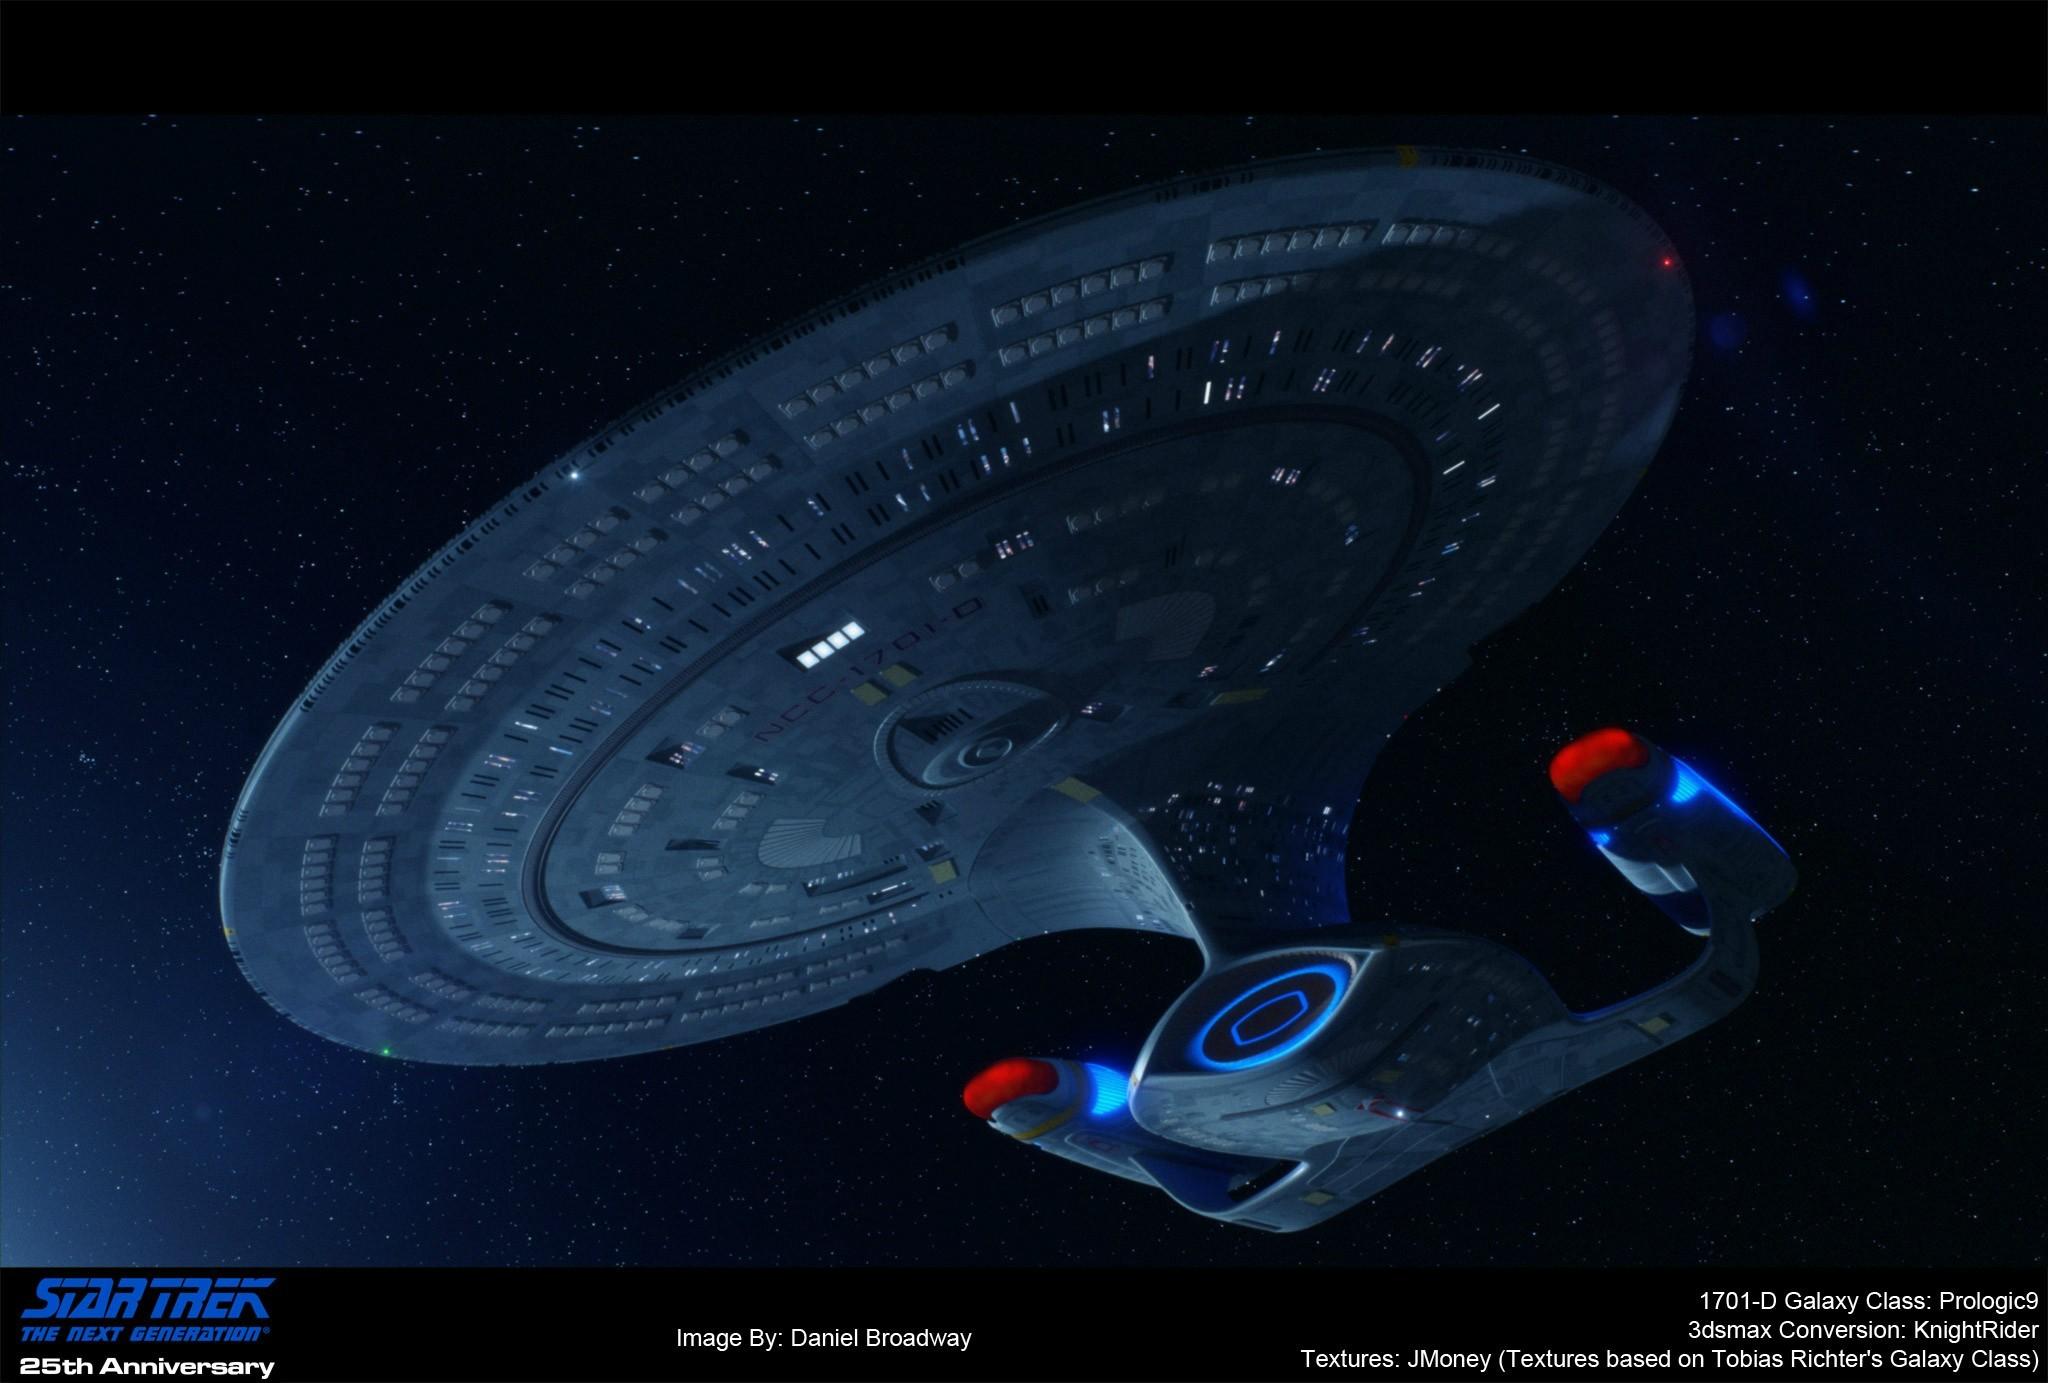 Star trek ships · A 3D render of the Enterprise 1701-D ~ by PixelMagic on  Reddit